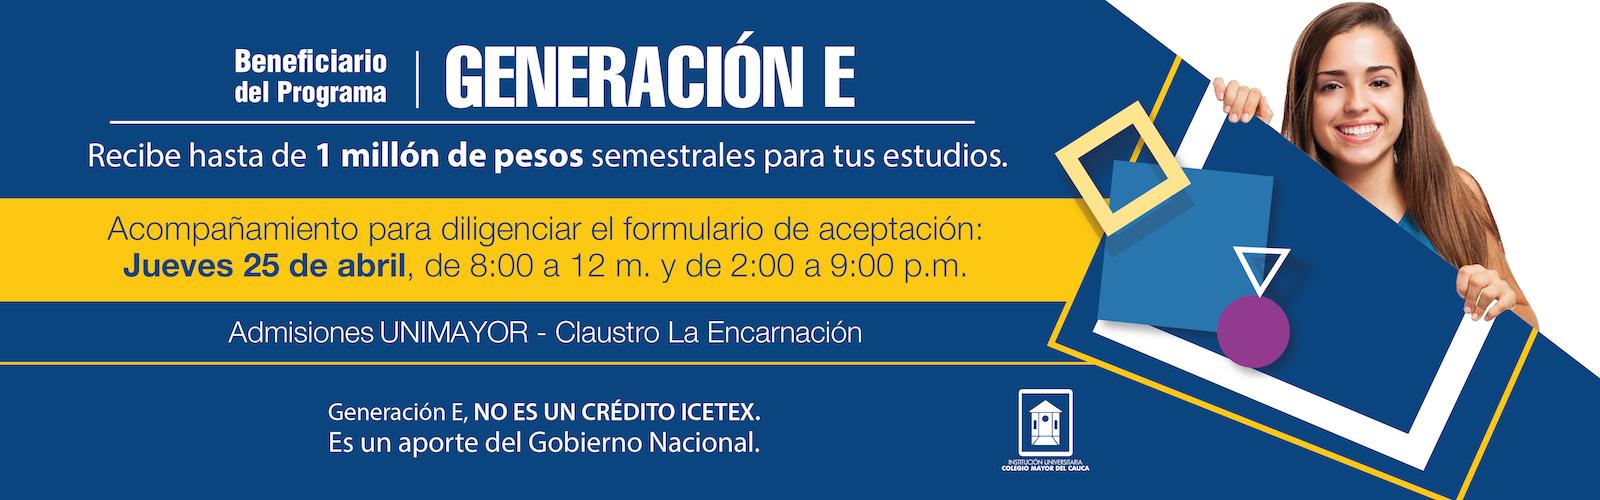 Generacion_E_03